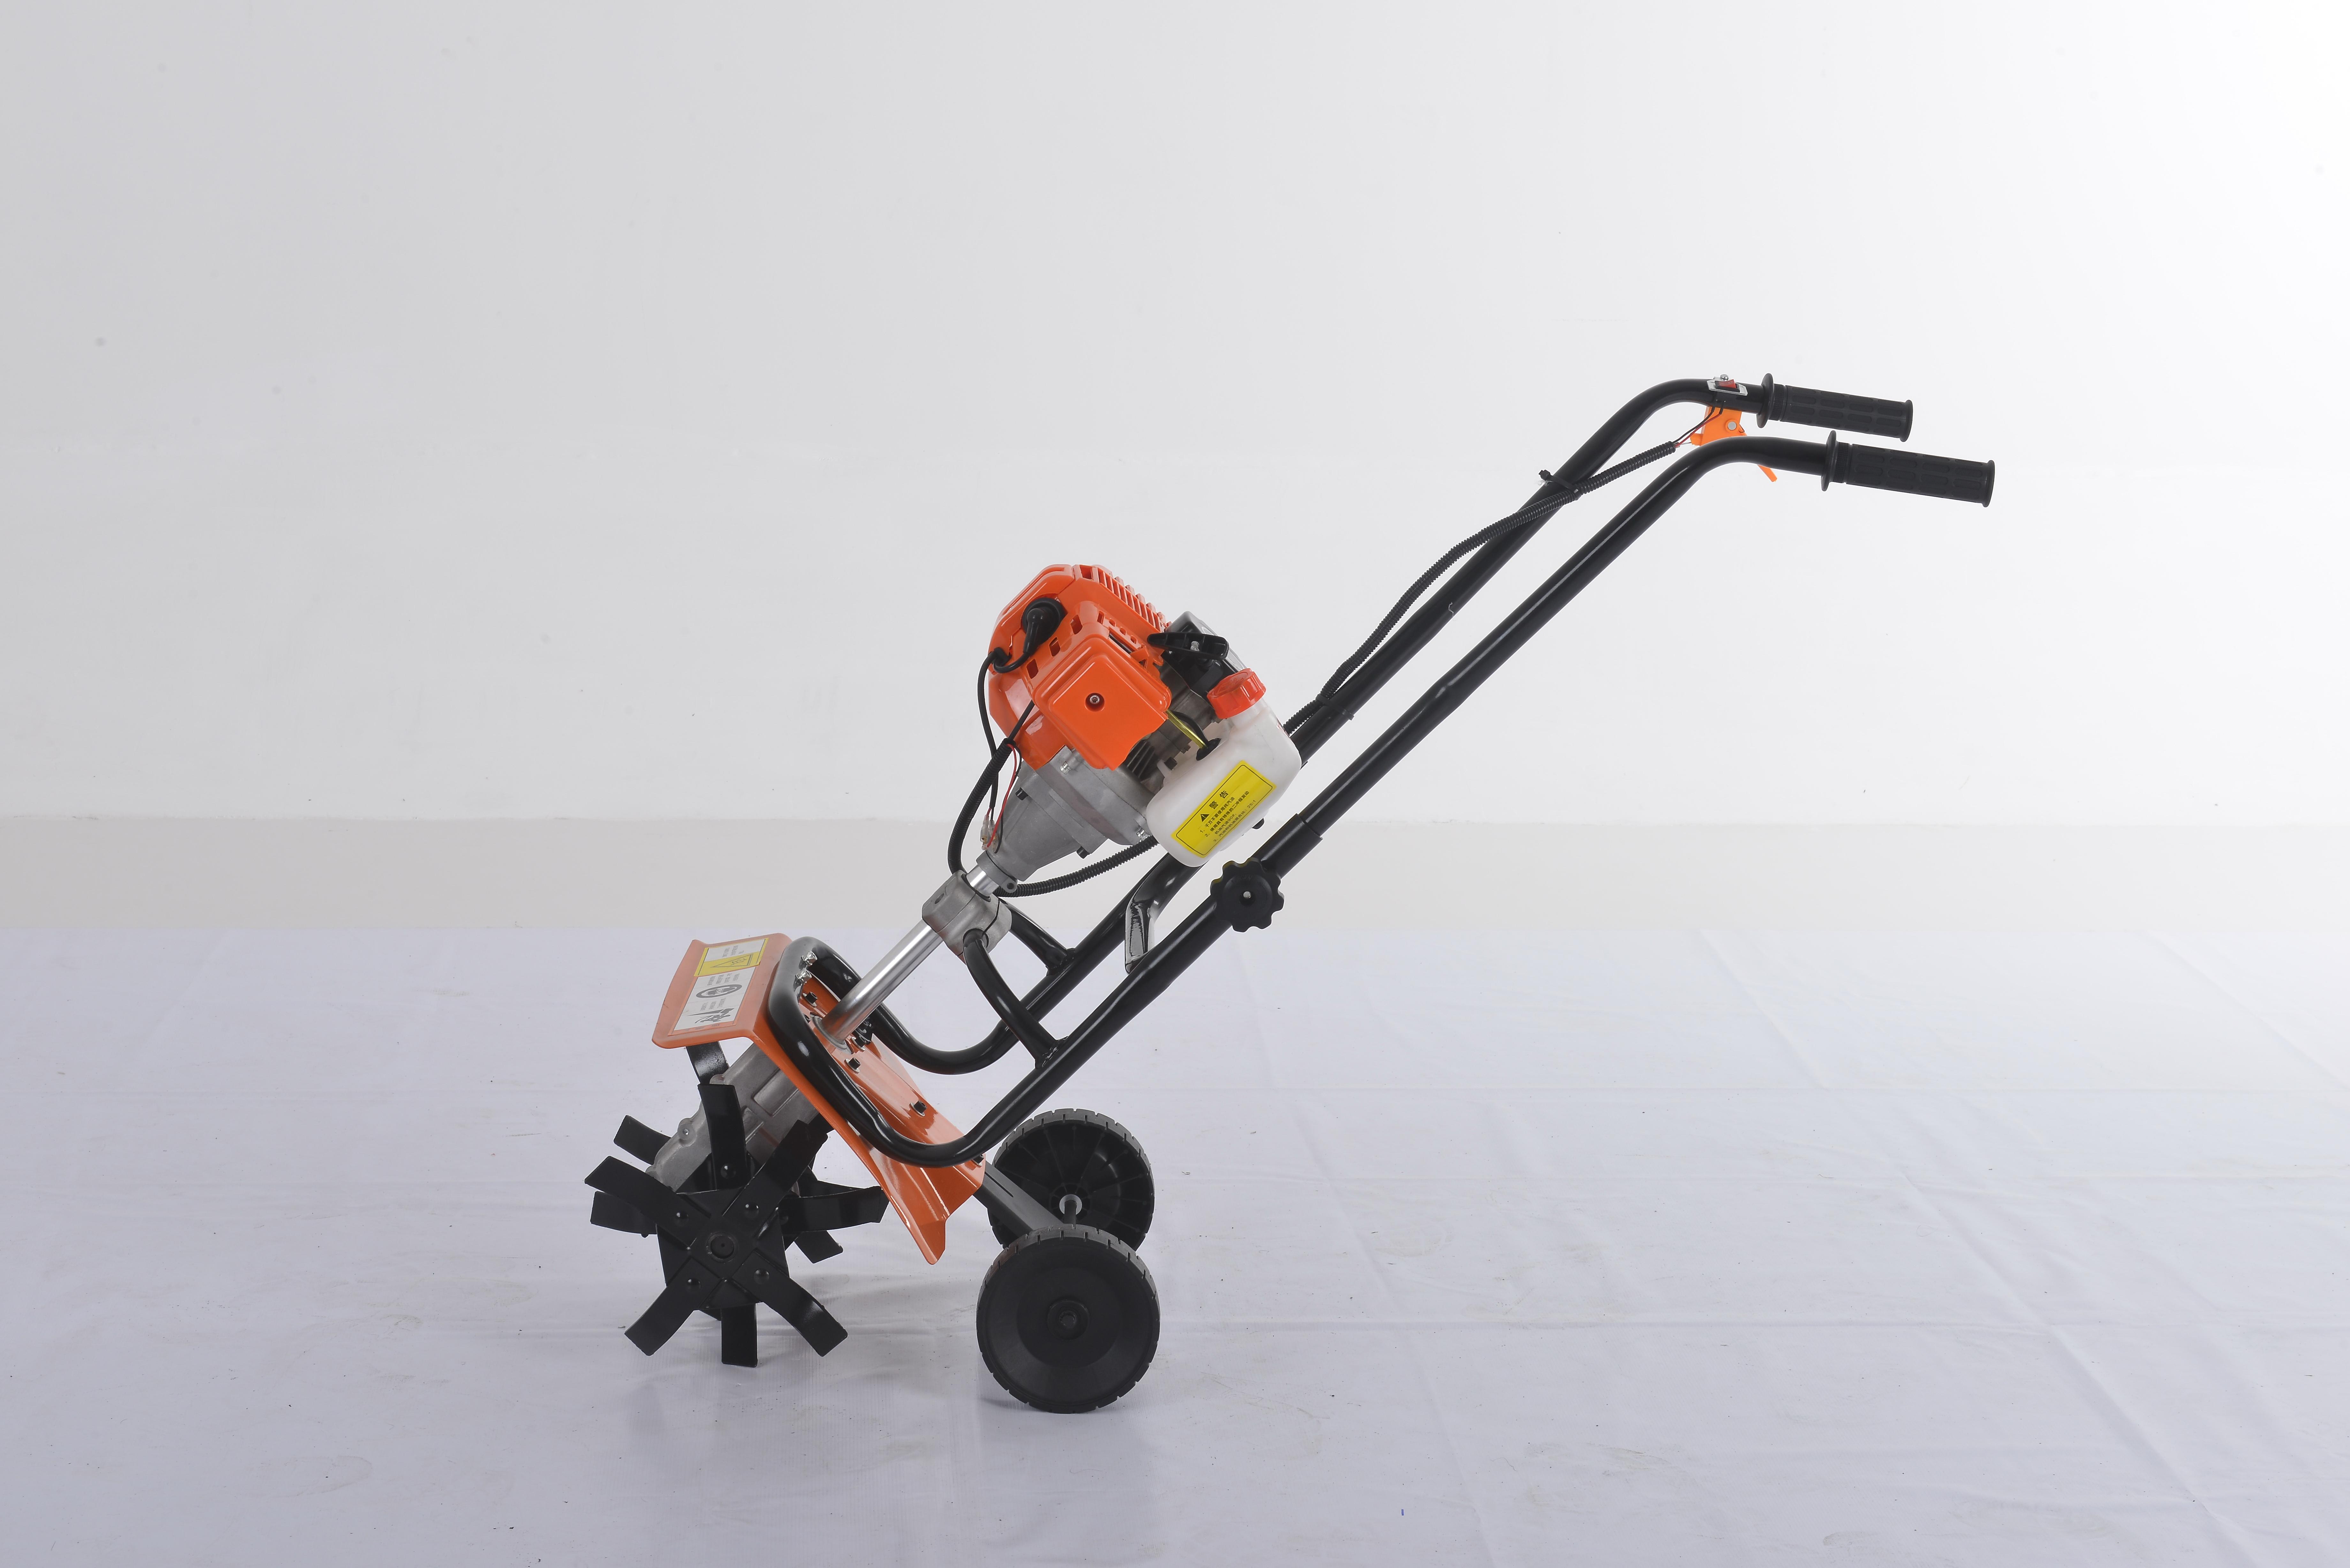 52cc Mini Tiller Cultivator with CE LY-8001